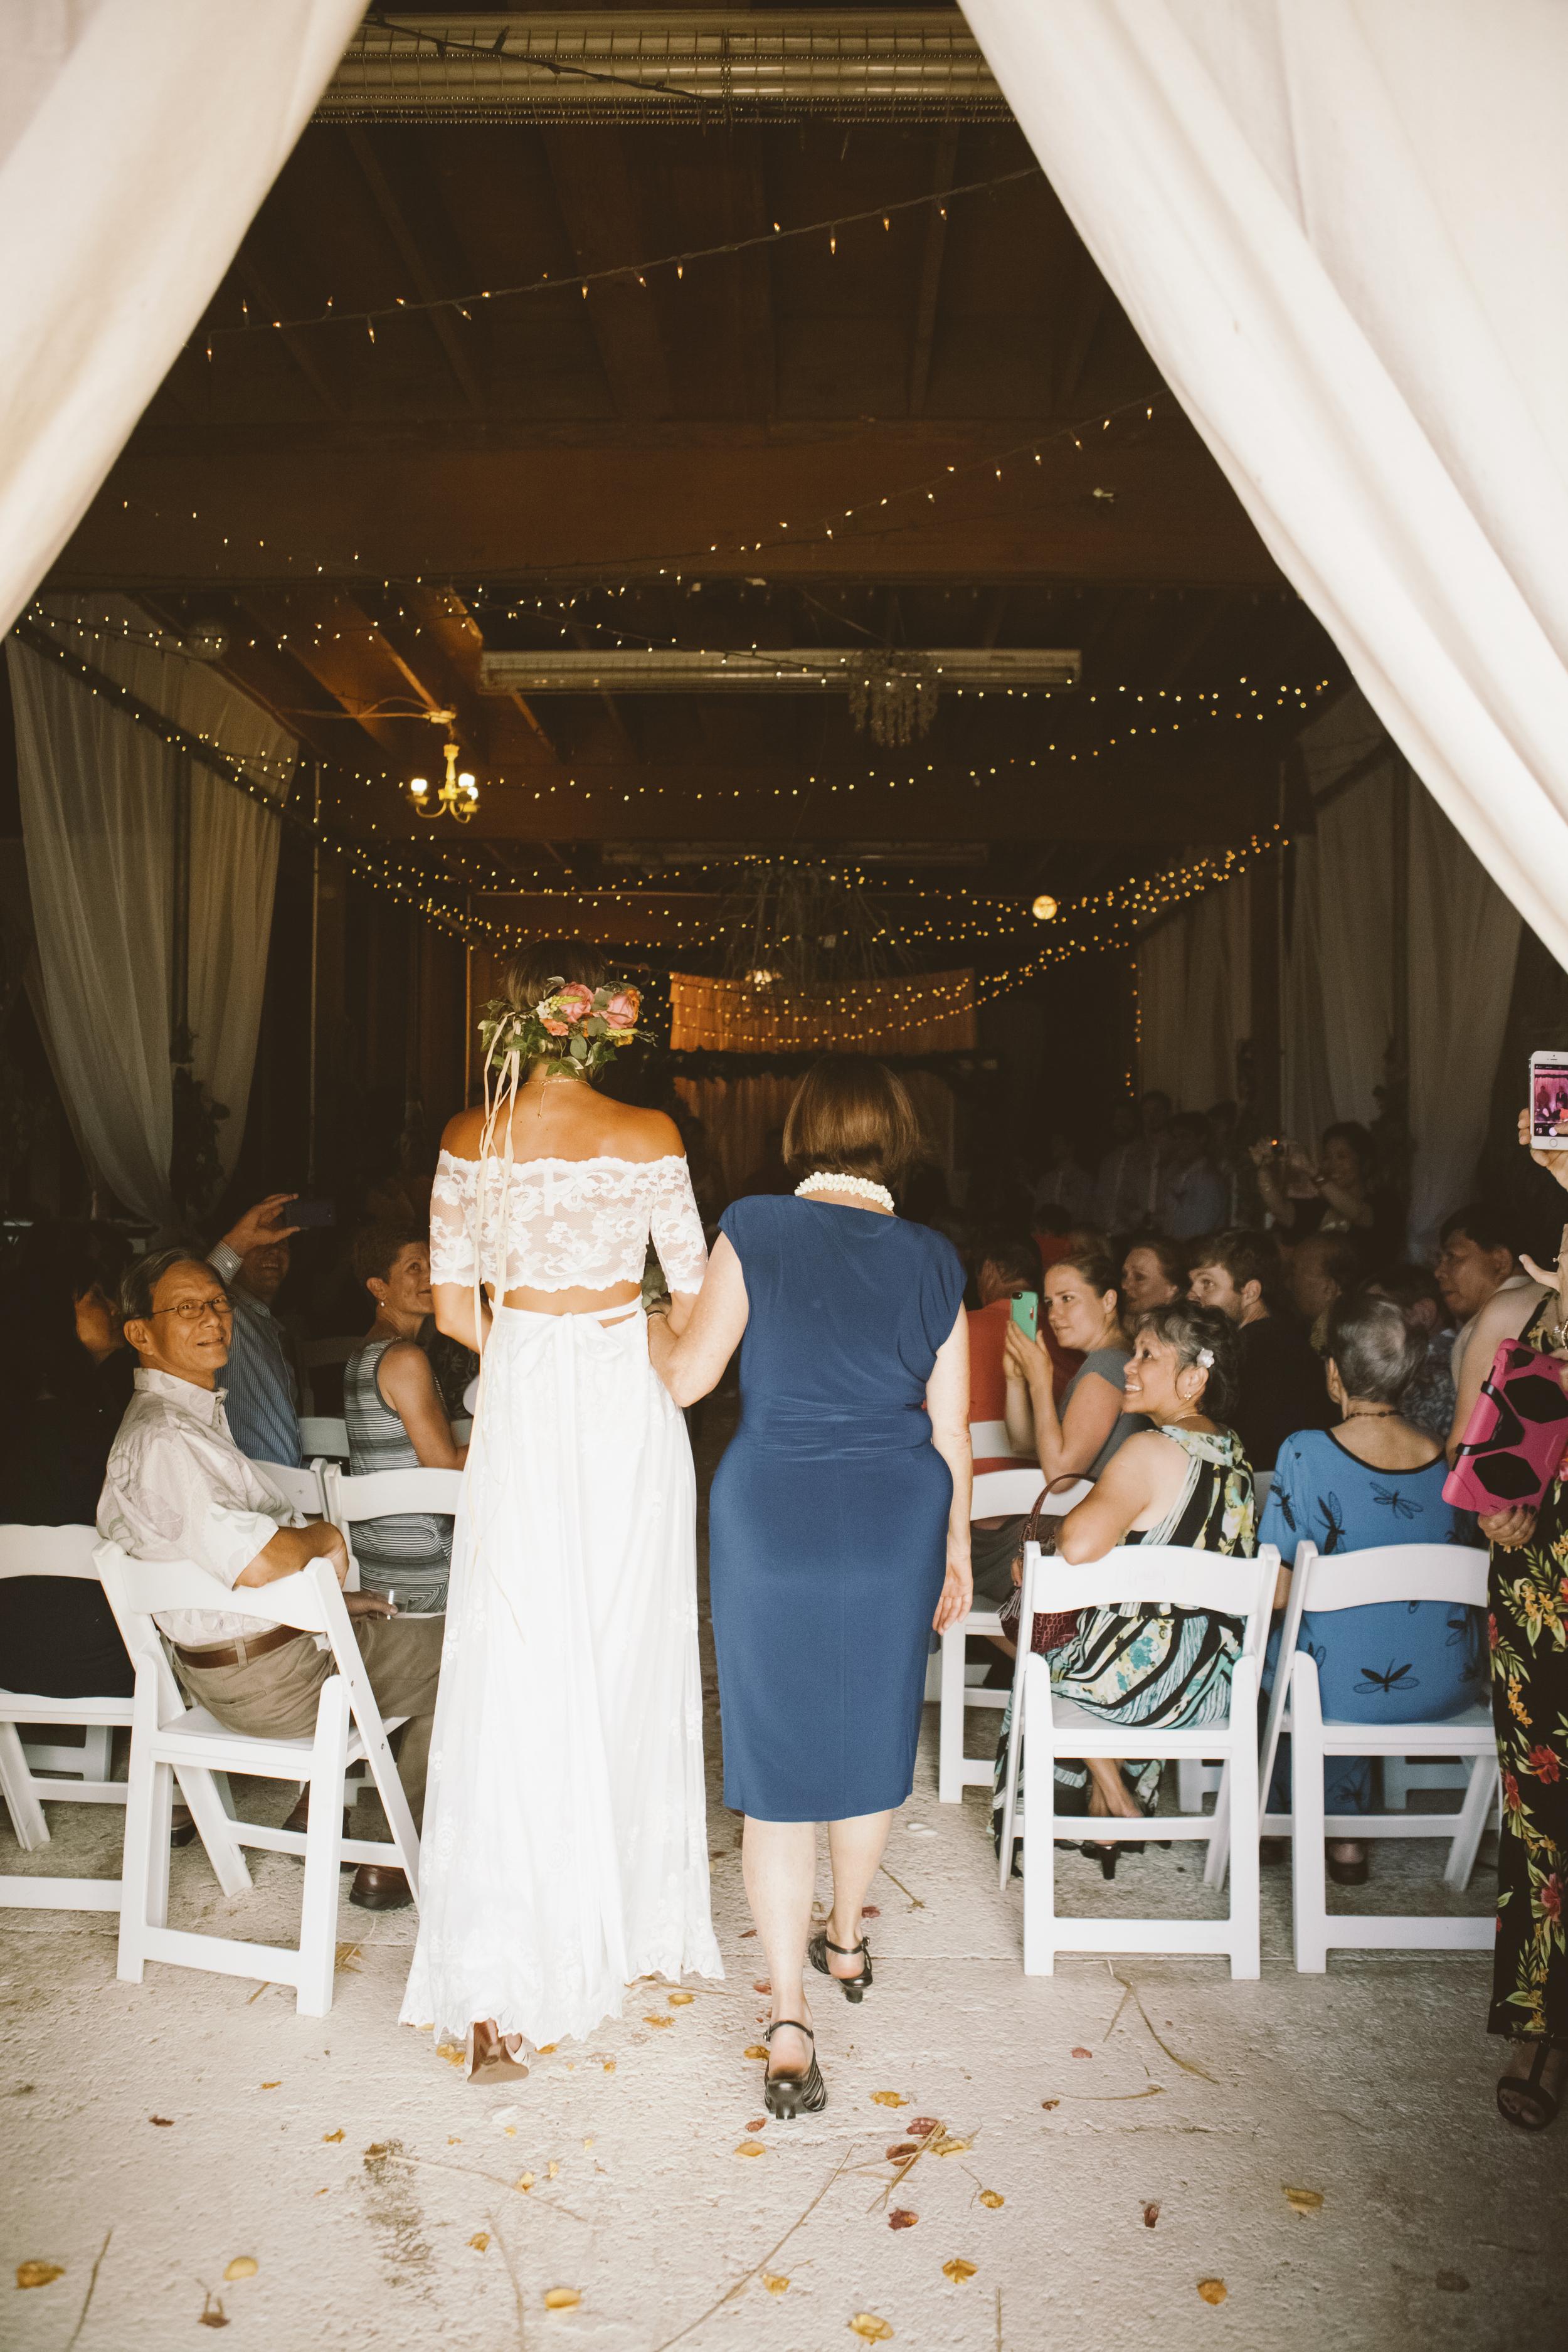 angie-diaz-photography-oahu-hawaii-wedding-tradewinds-ranch-52.jpg